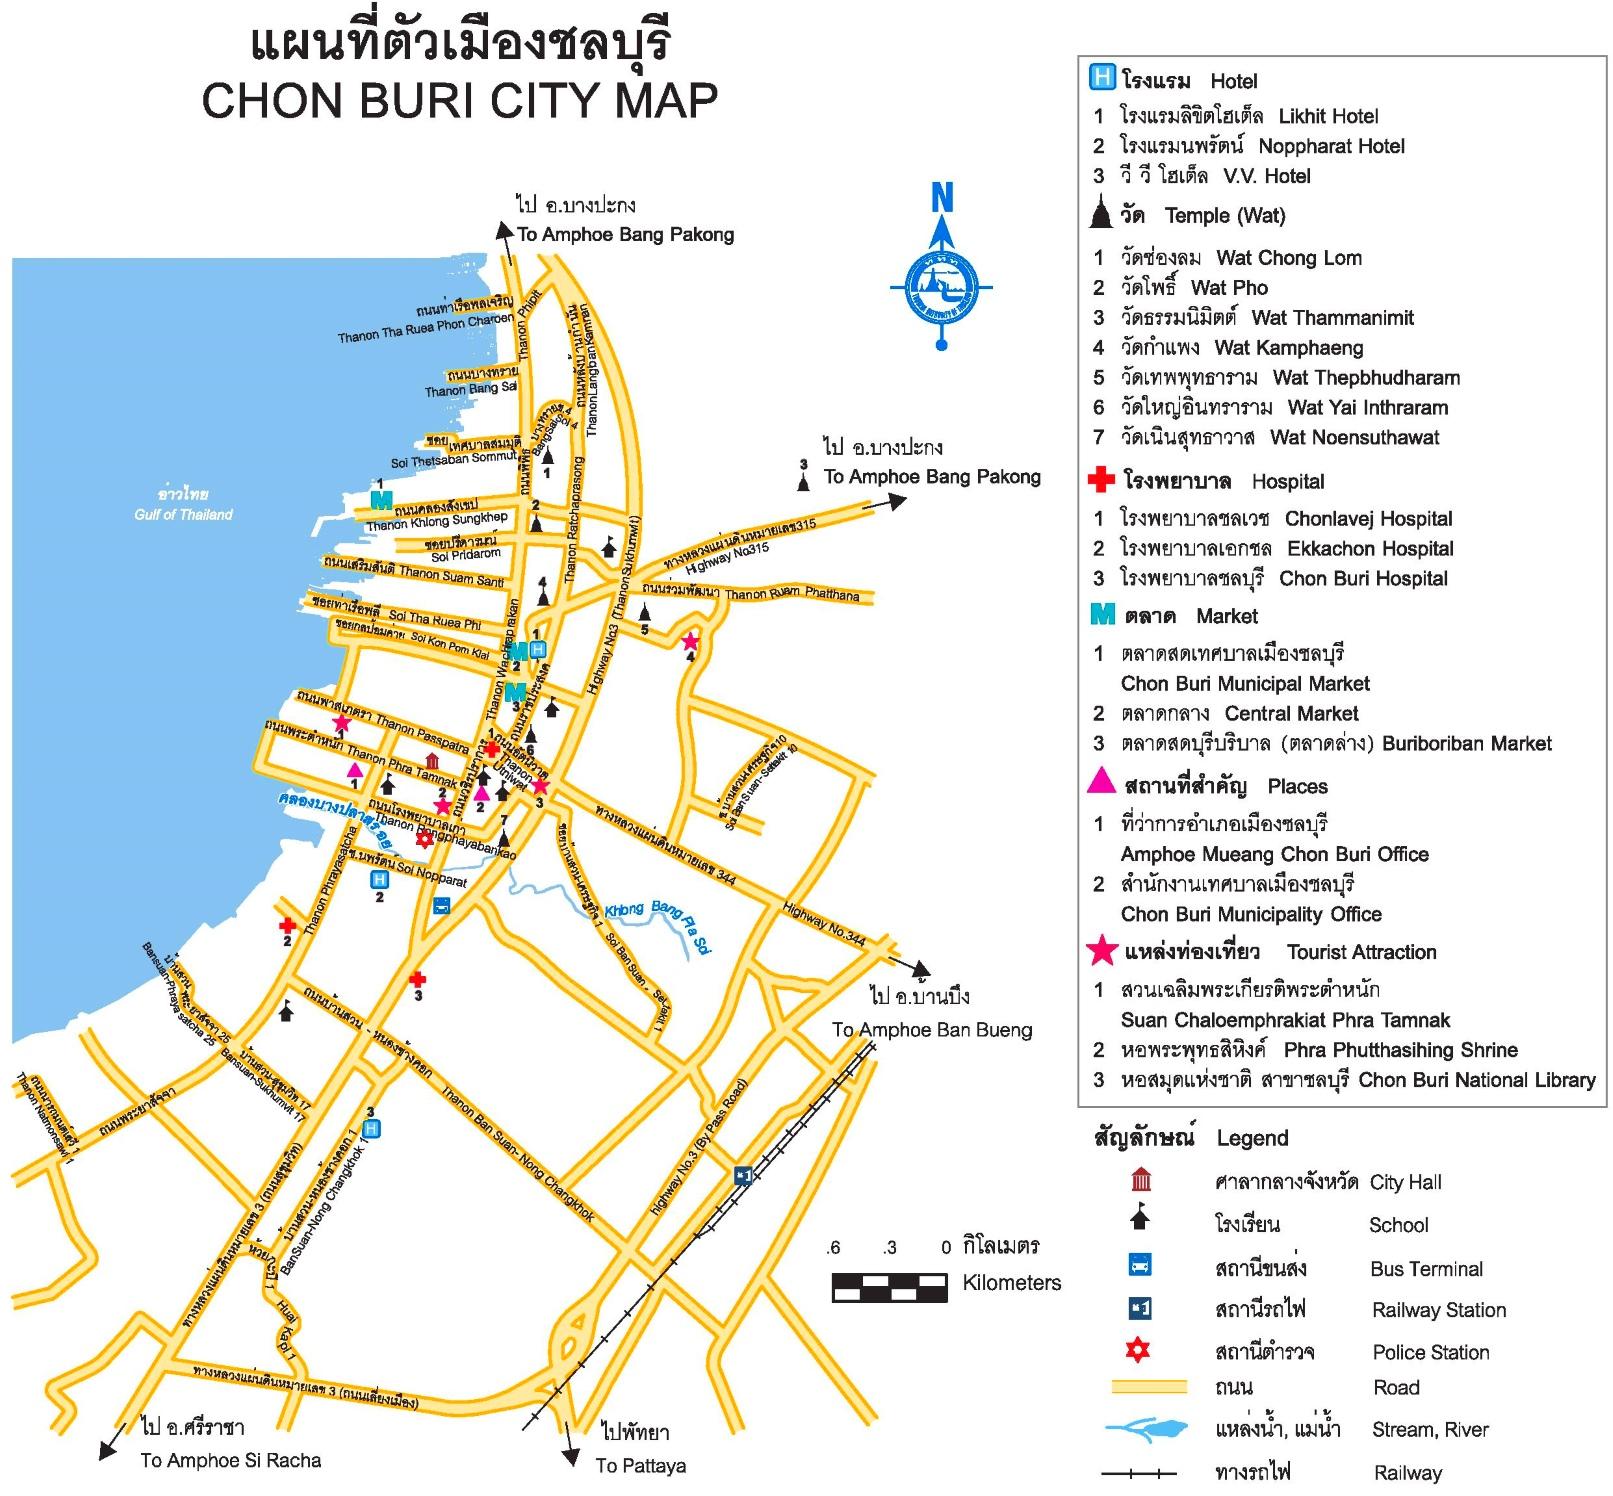 Chonburi Maps Thailand Maps of Chonburi City